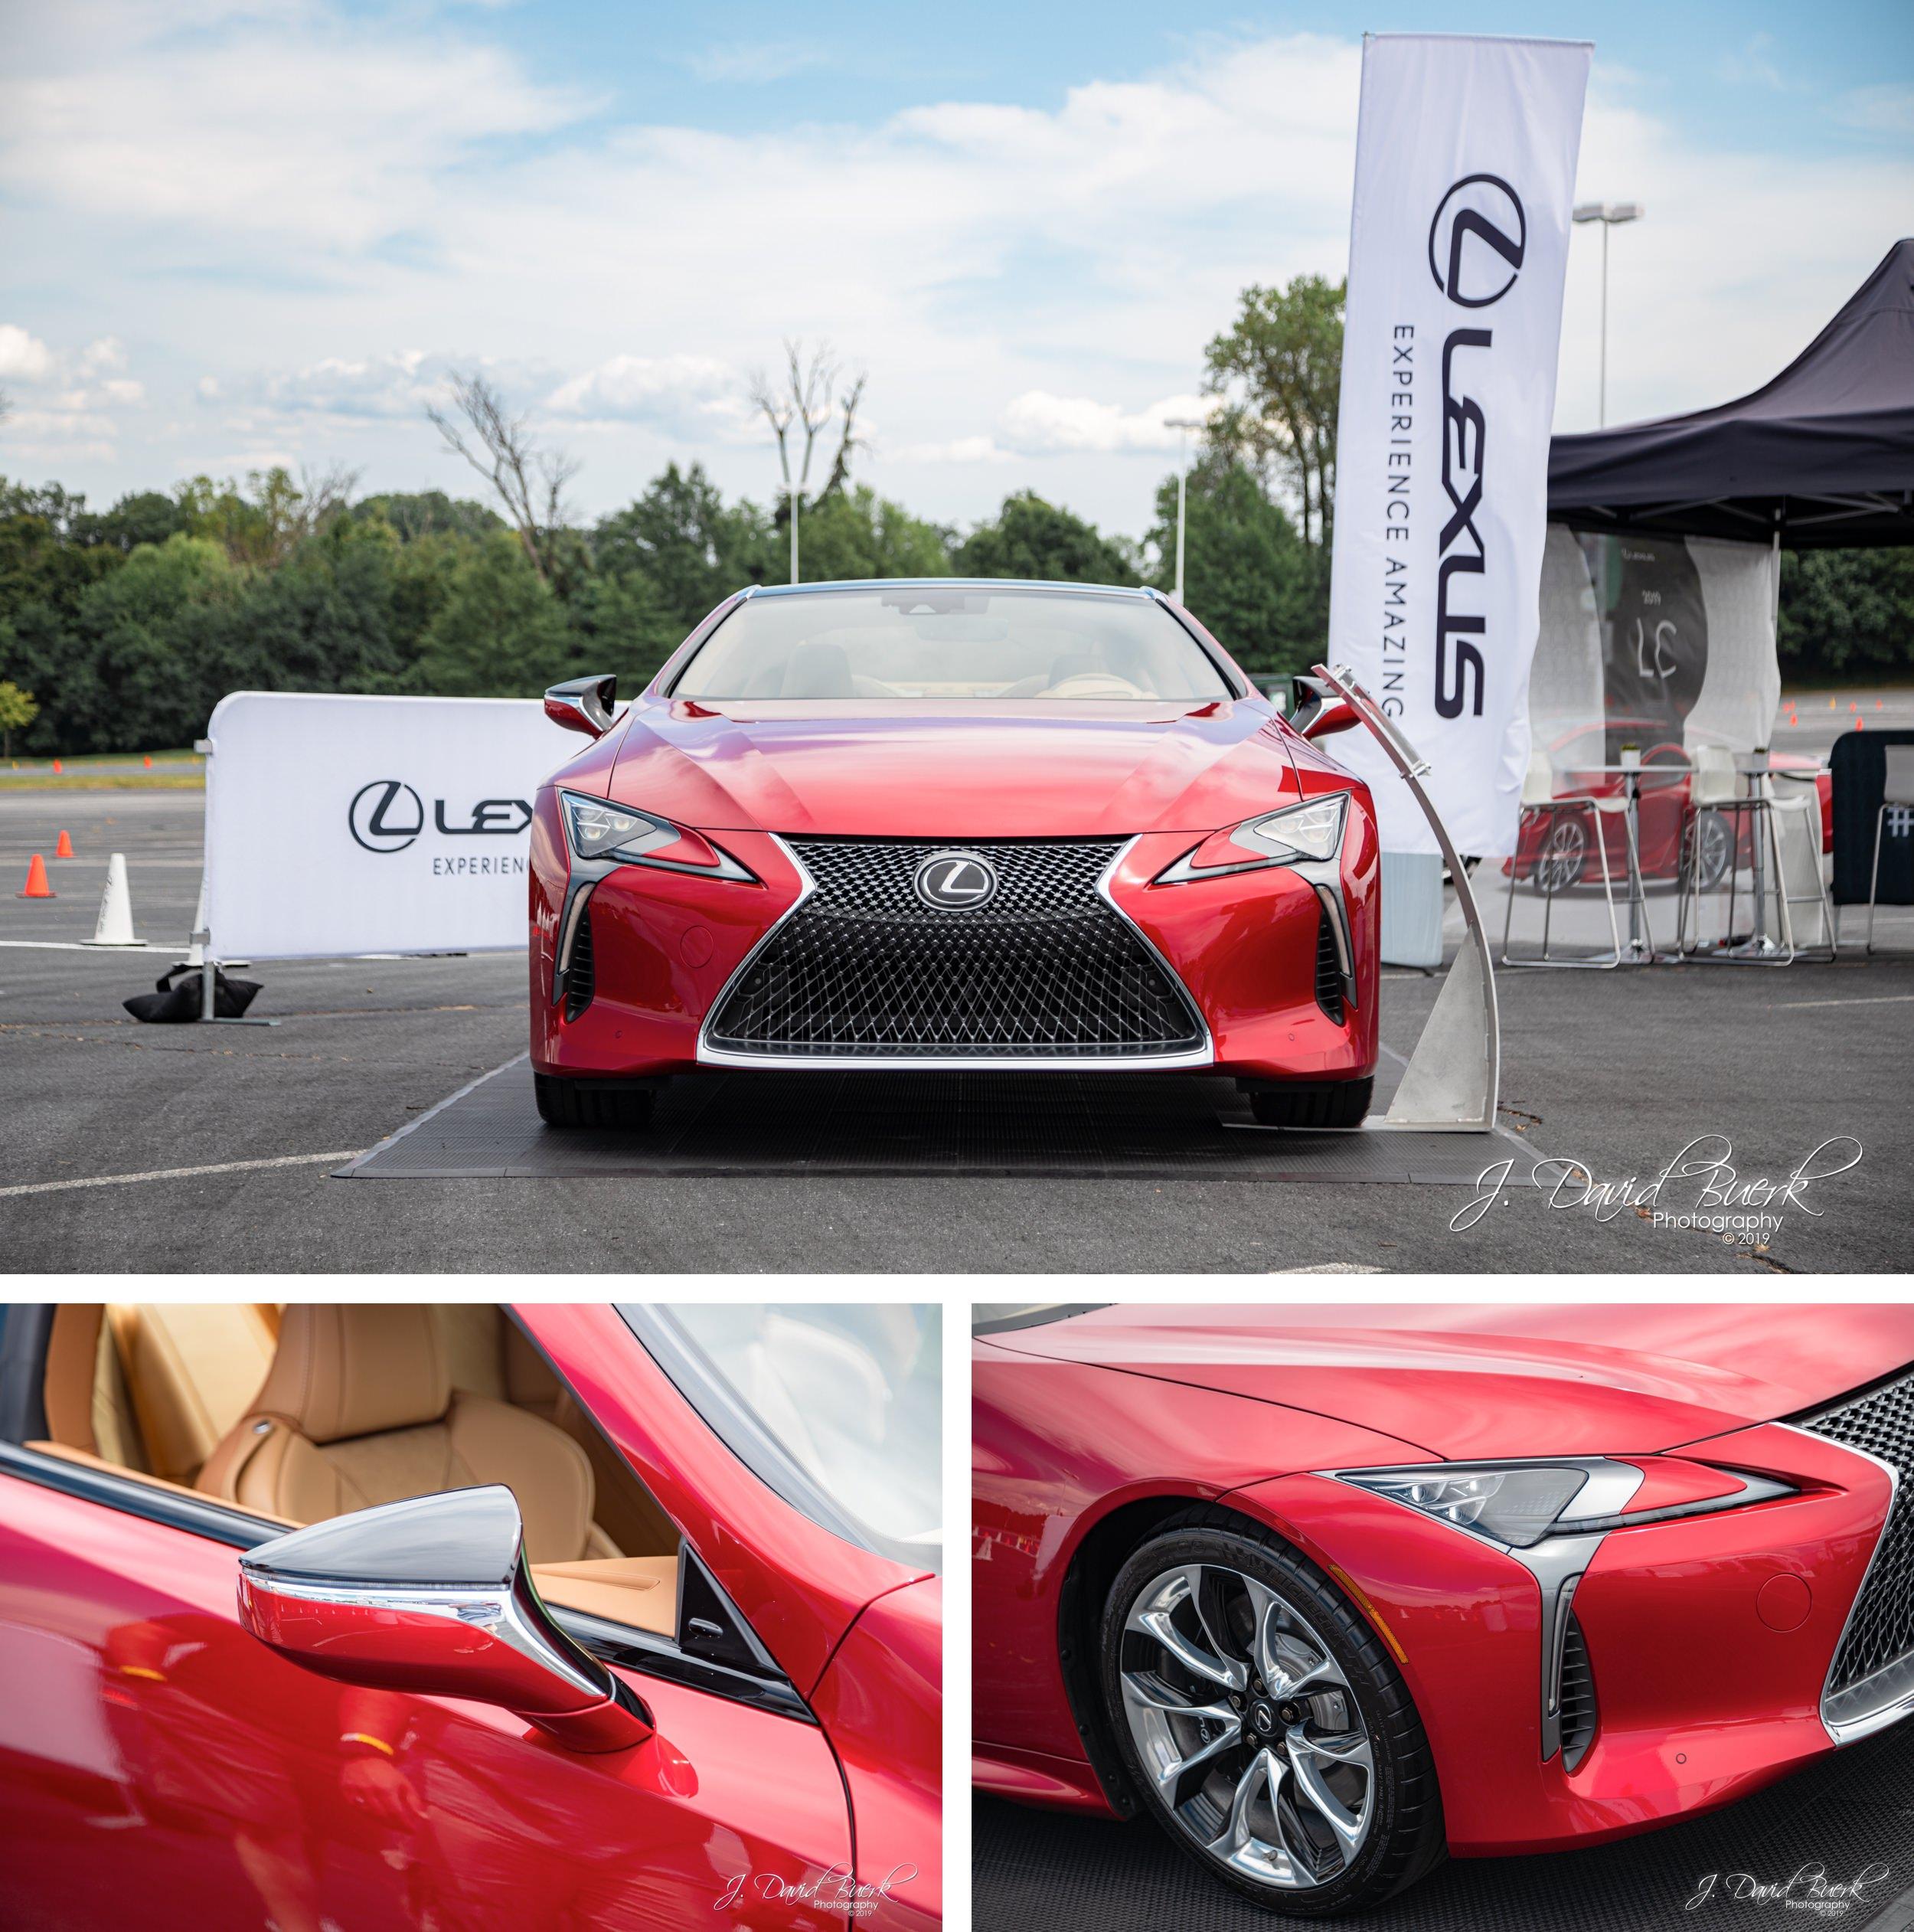 20190810 - Lexus Experience Amazing Drive Event 5.jpg